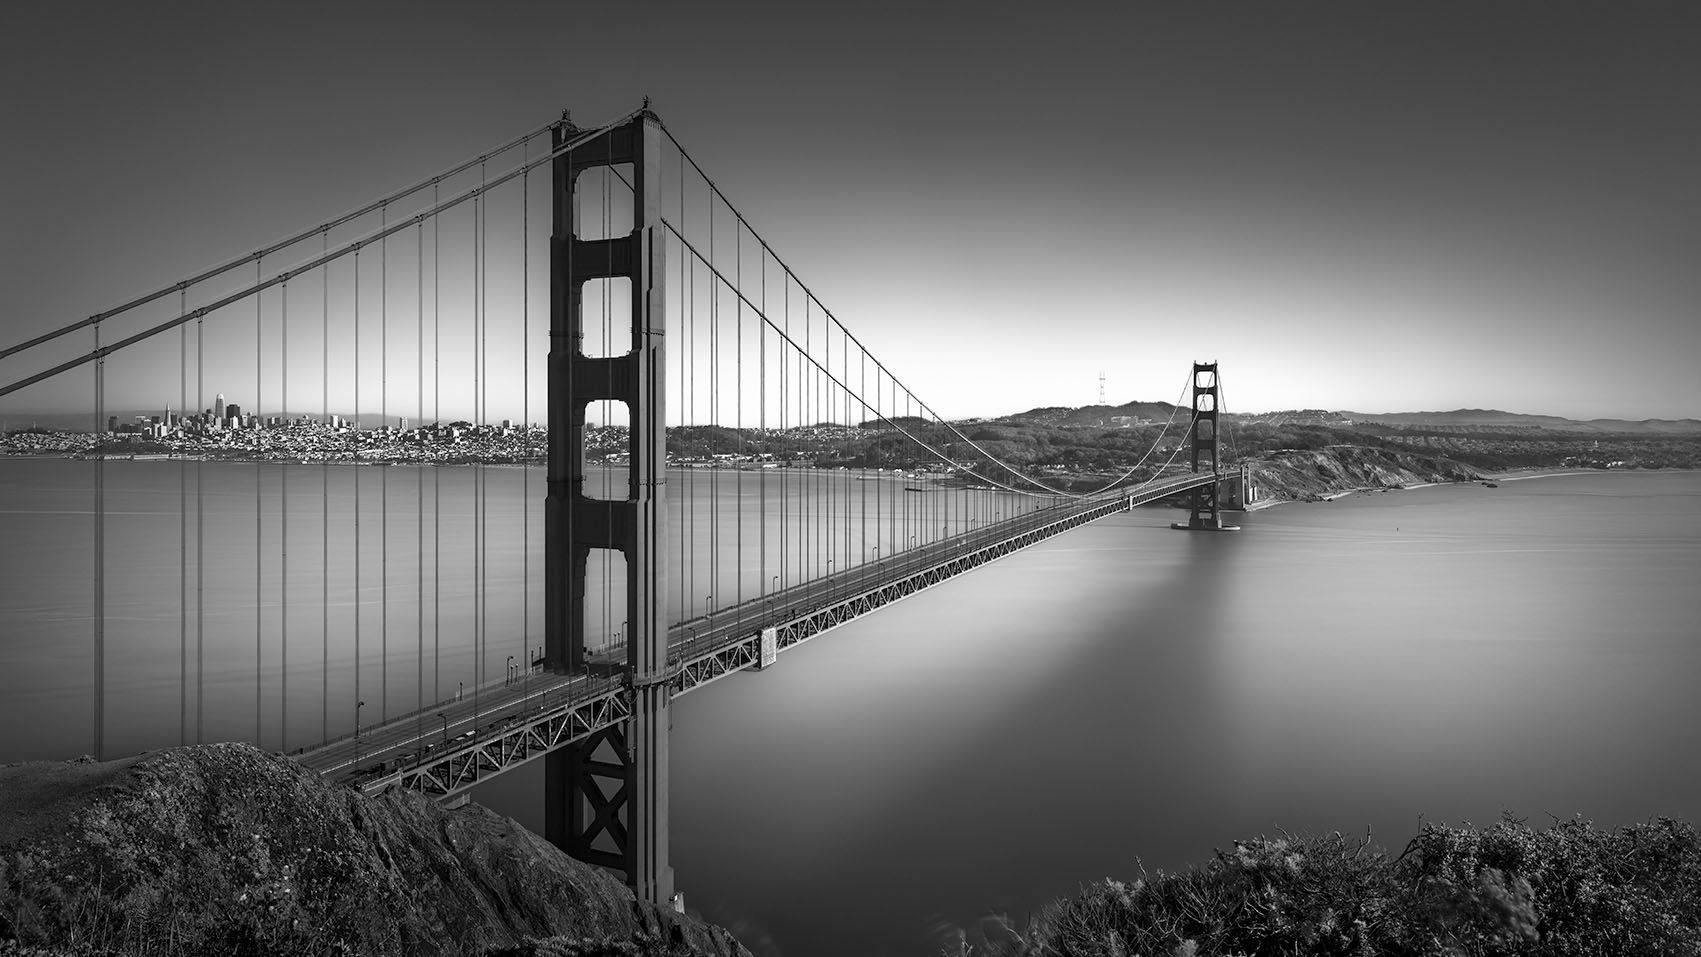 Wings II - San Francisco - © Julia Anna Gospodarou 2021